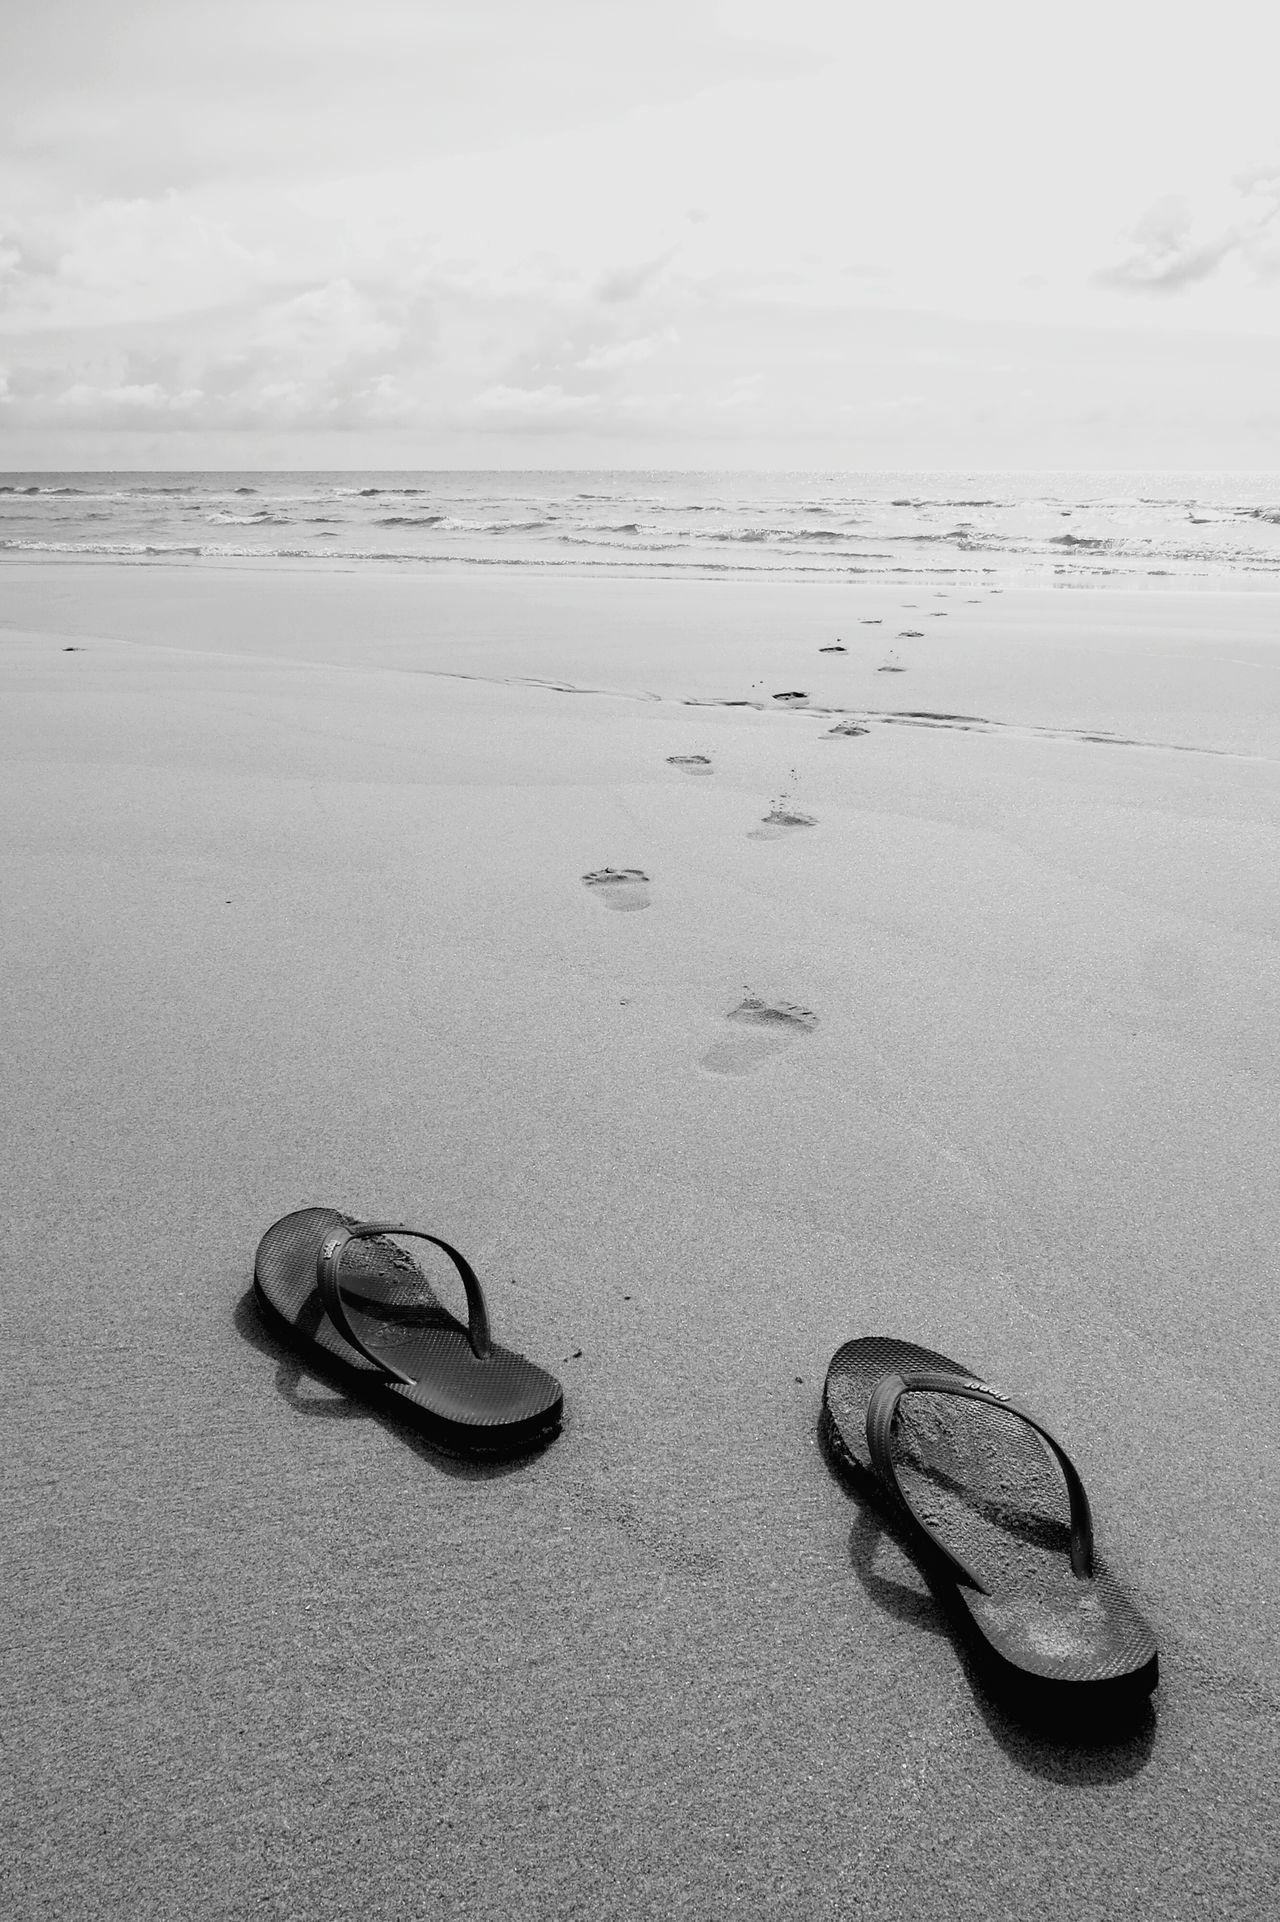 Flipflops Footprints Footstep Eyeem Collection EyeEm Vision EyeEm Filter Beach Sand Go Traveling Adventure Club